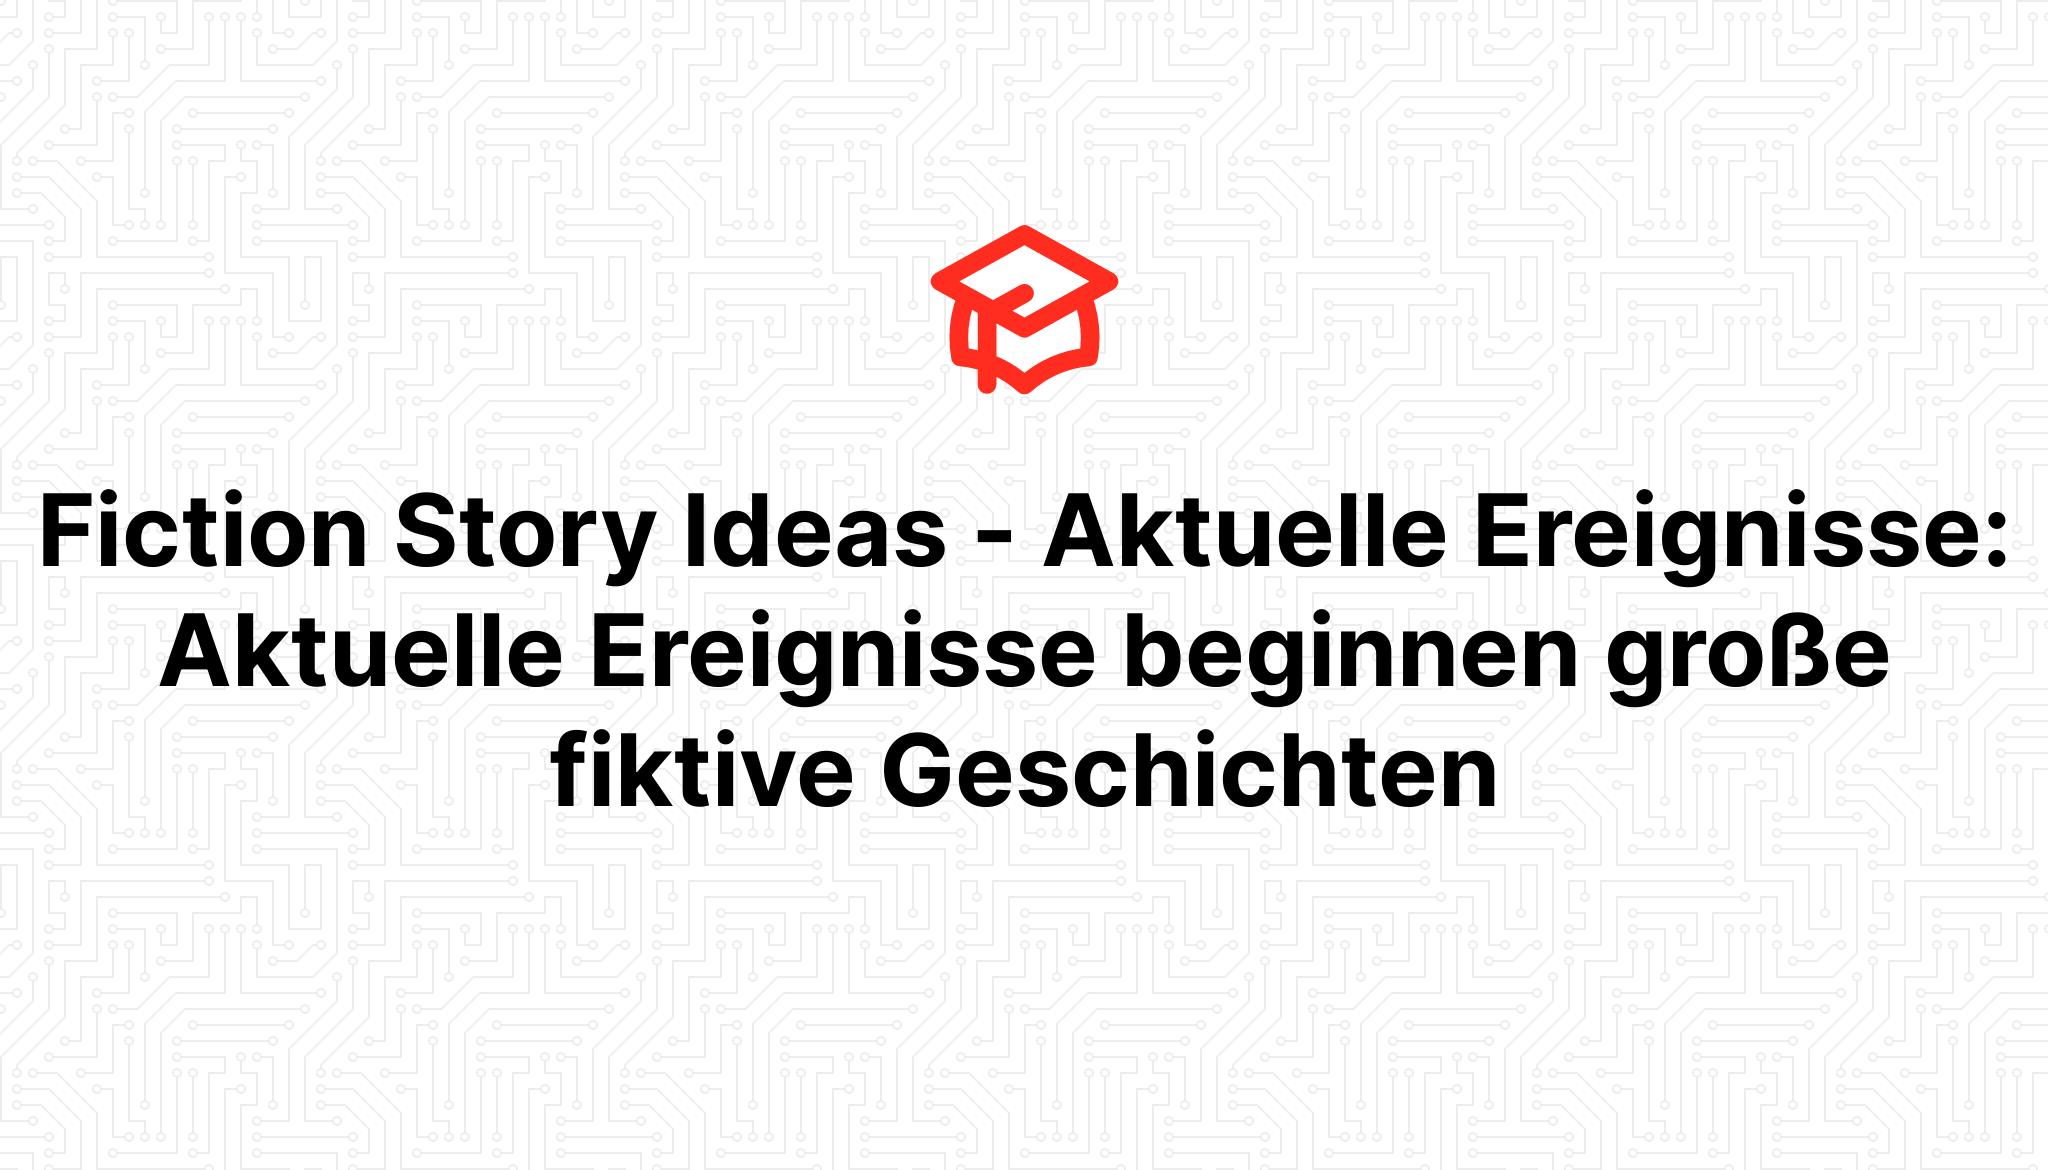 Fiction Story Ideas – Aktuelle Ereignisse: Aktuelle Ereignisse beginnen große fiktive Geschichten